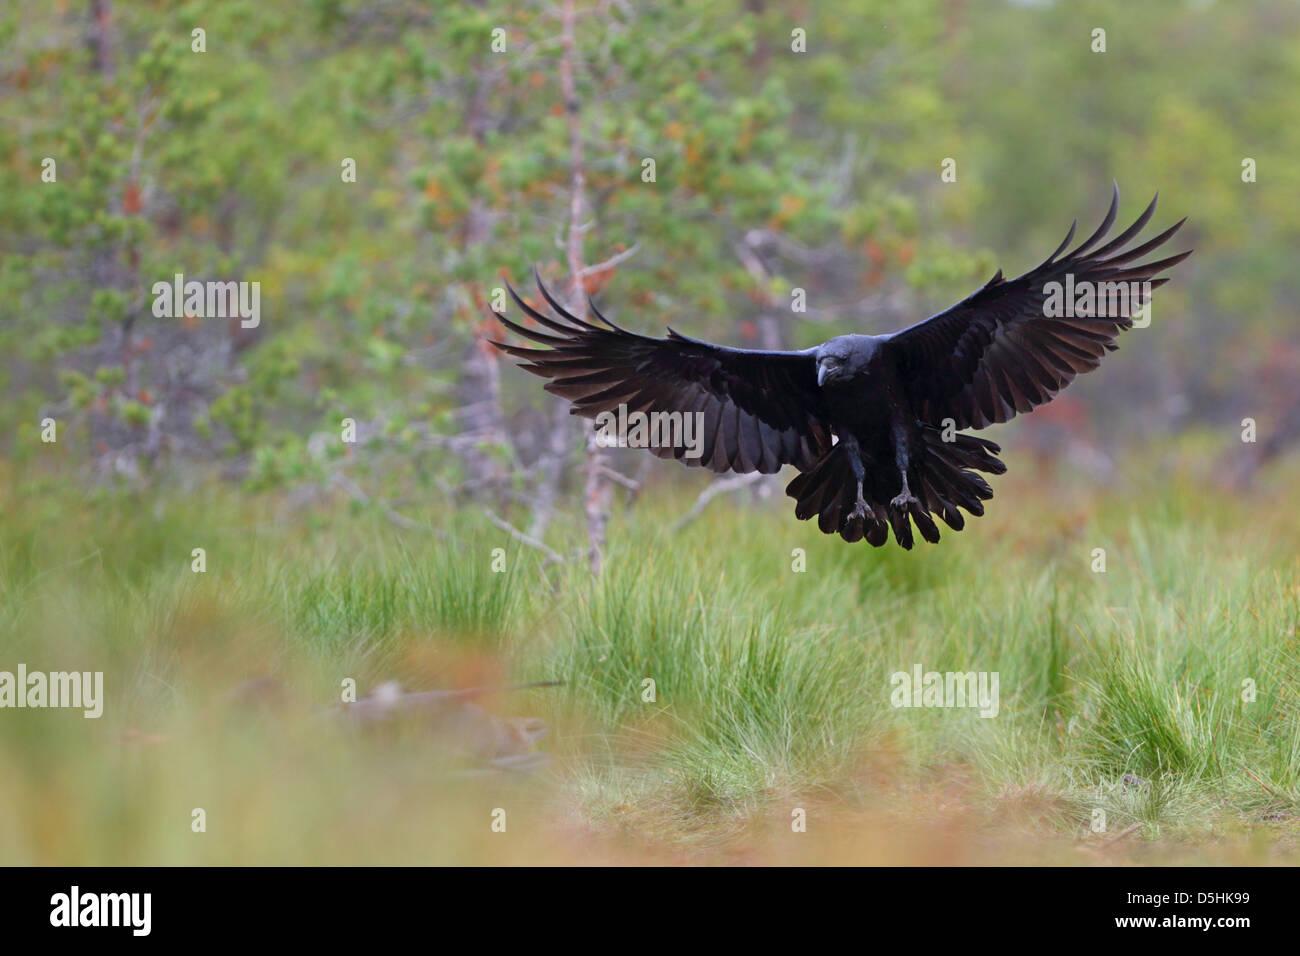 Raven (Corvus Corax) im Sumpf Wald, Europa Stockbild